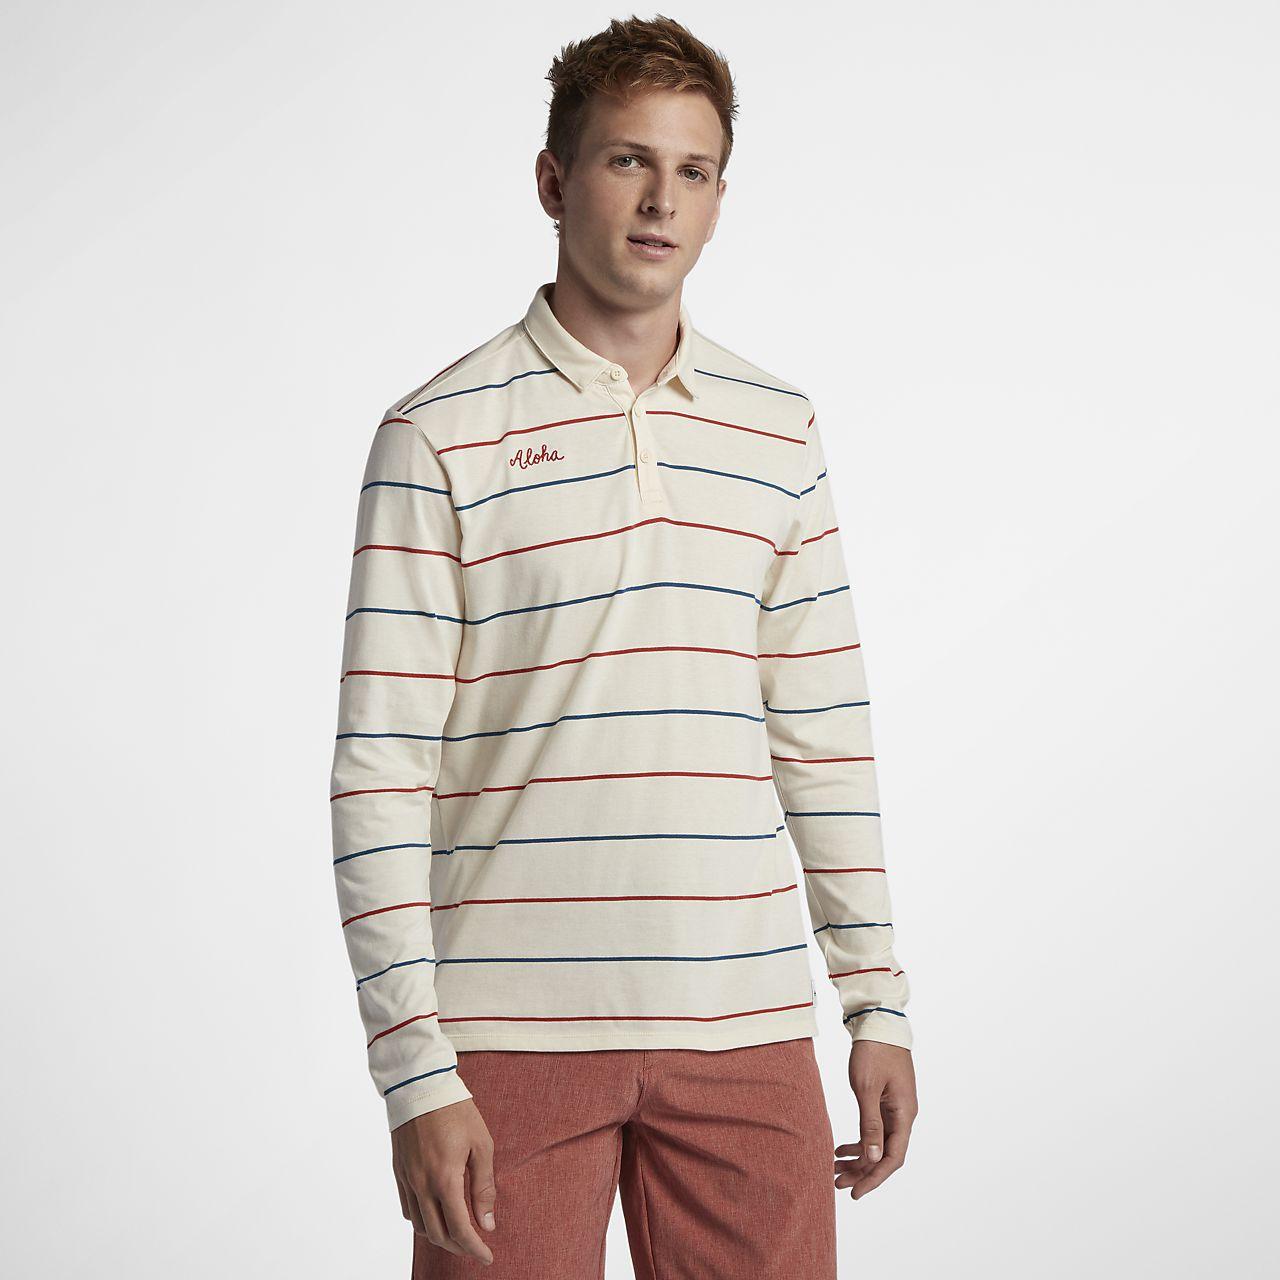 Мужская рубашка с длинным рукавом Hurley Channels Polo